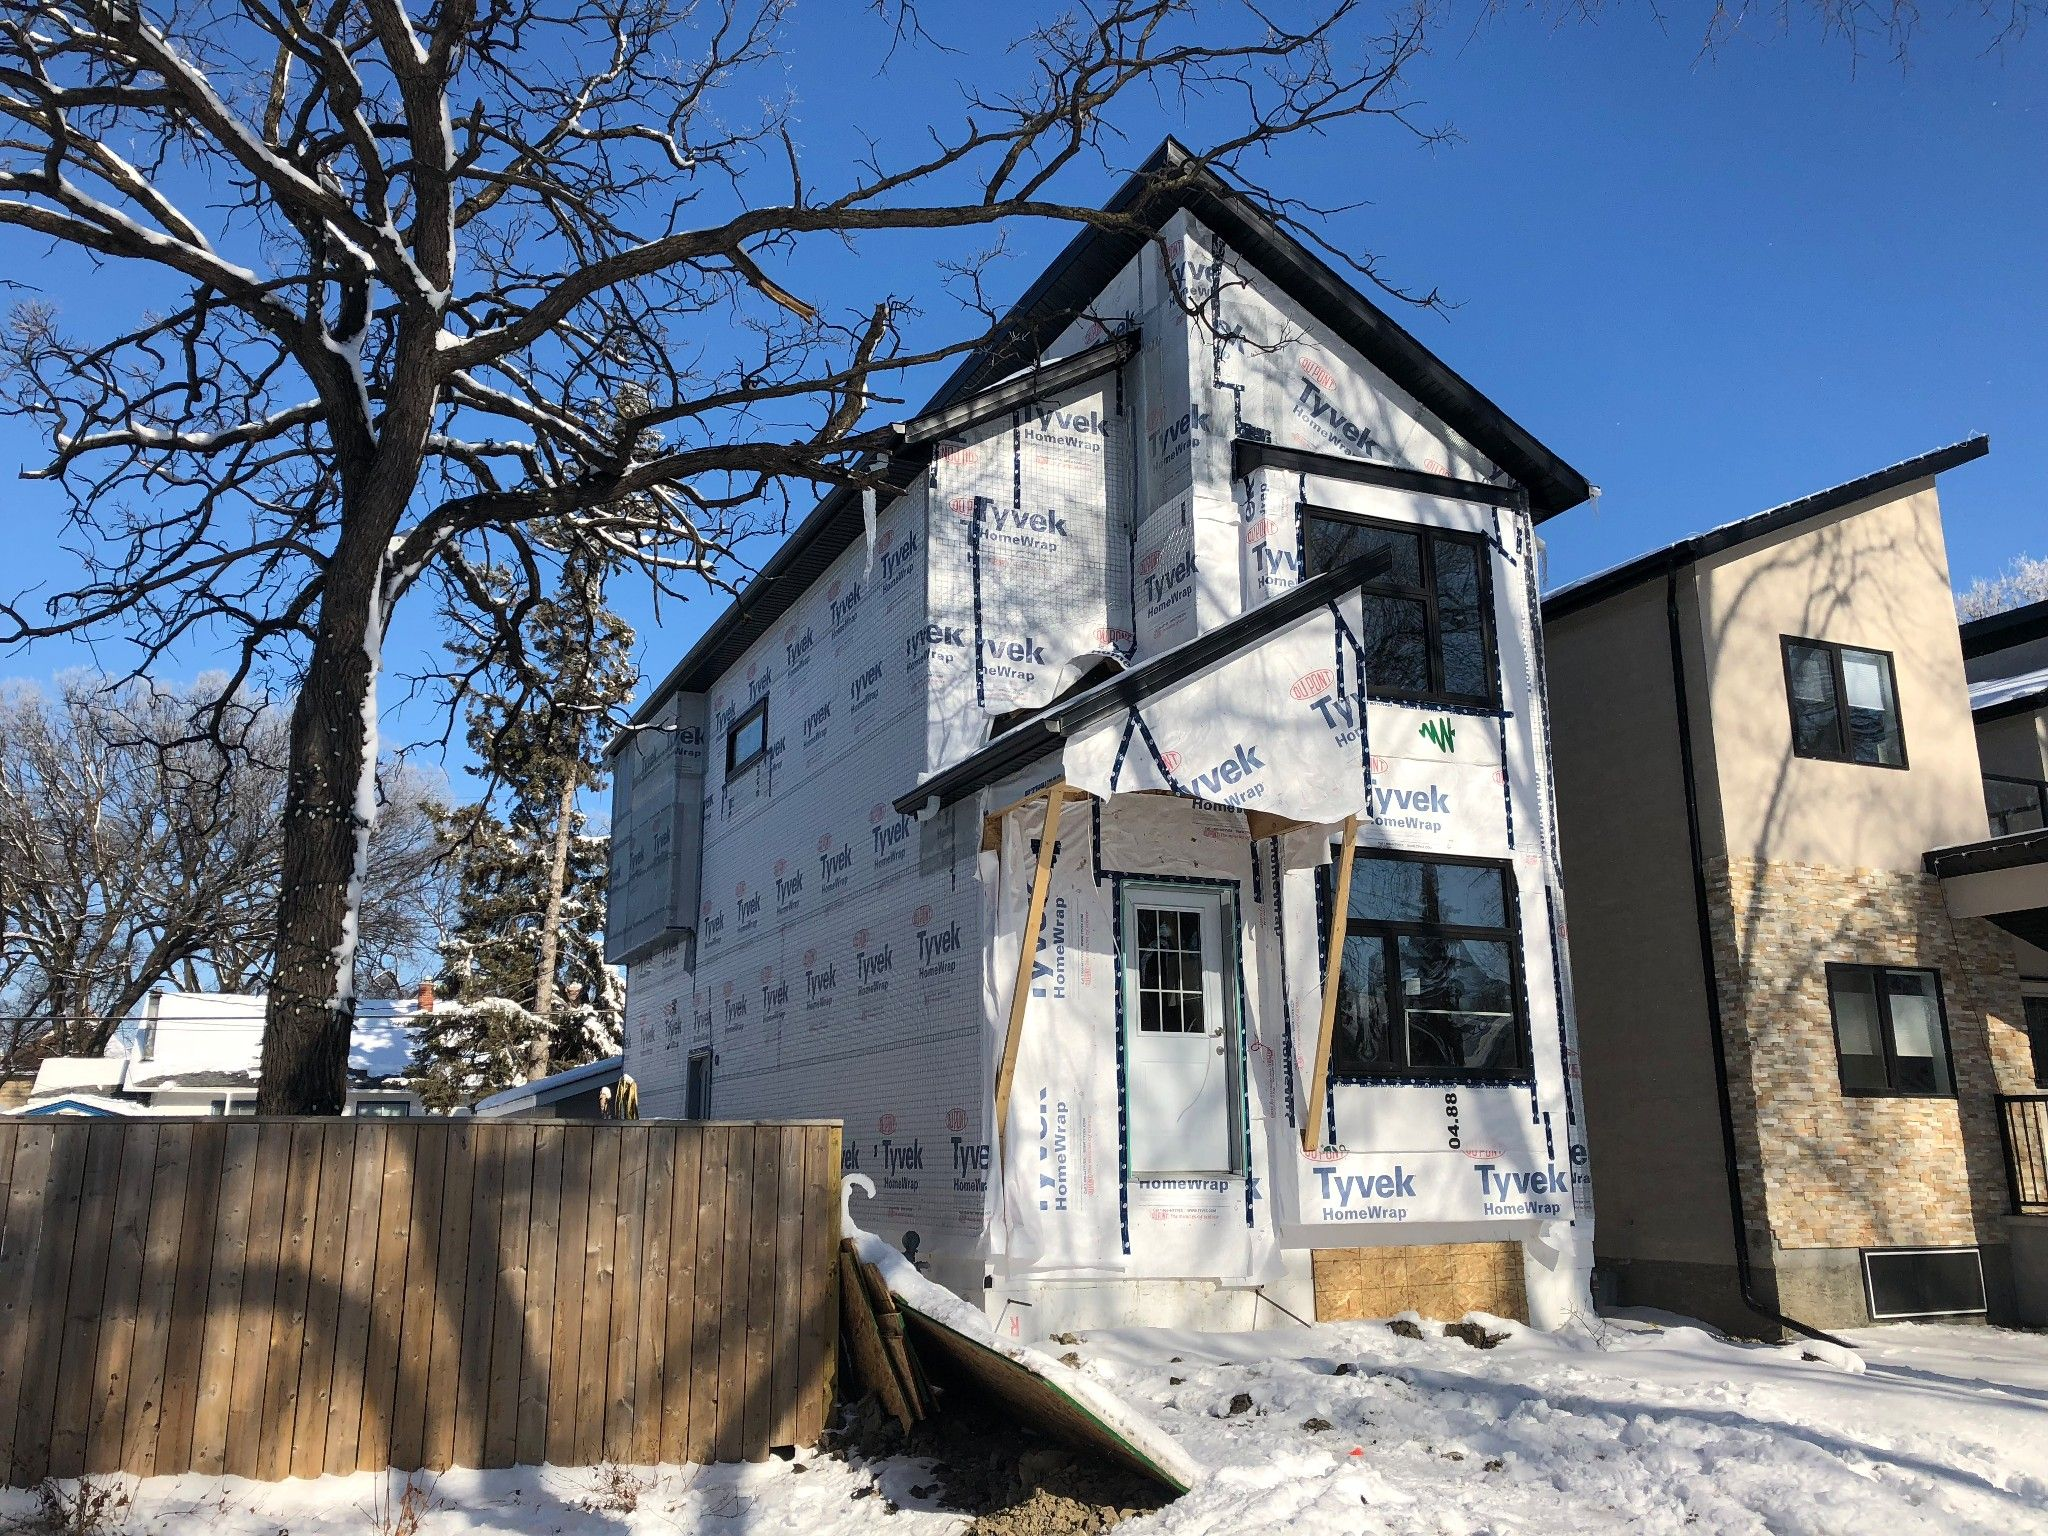 Main Photo: 755 Garwood Avenue in Winnipeg: Crescentwood Single Family Detached for sale (1B)  : MLS®# 1811833